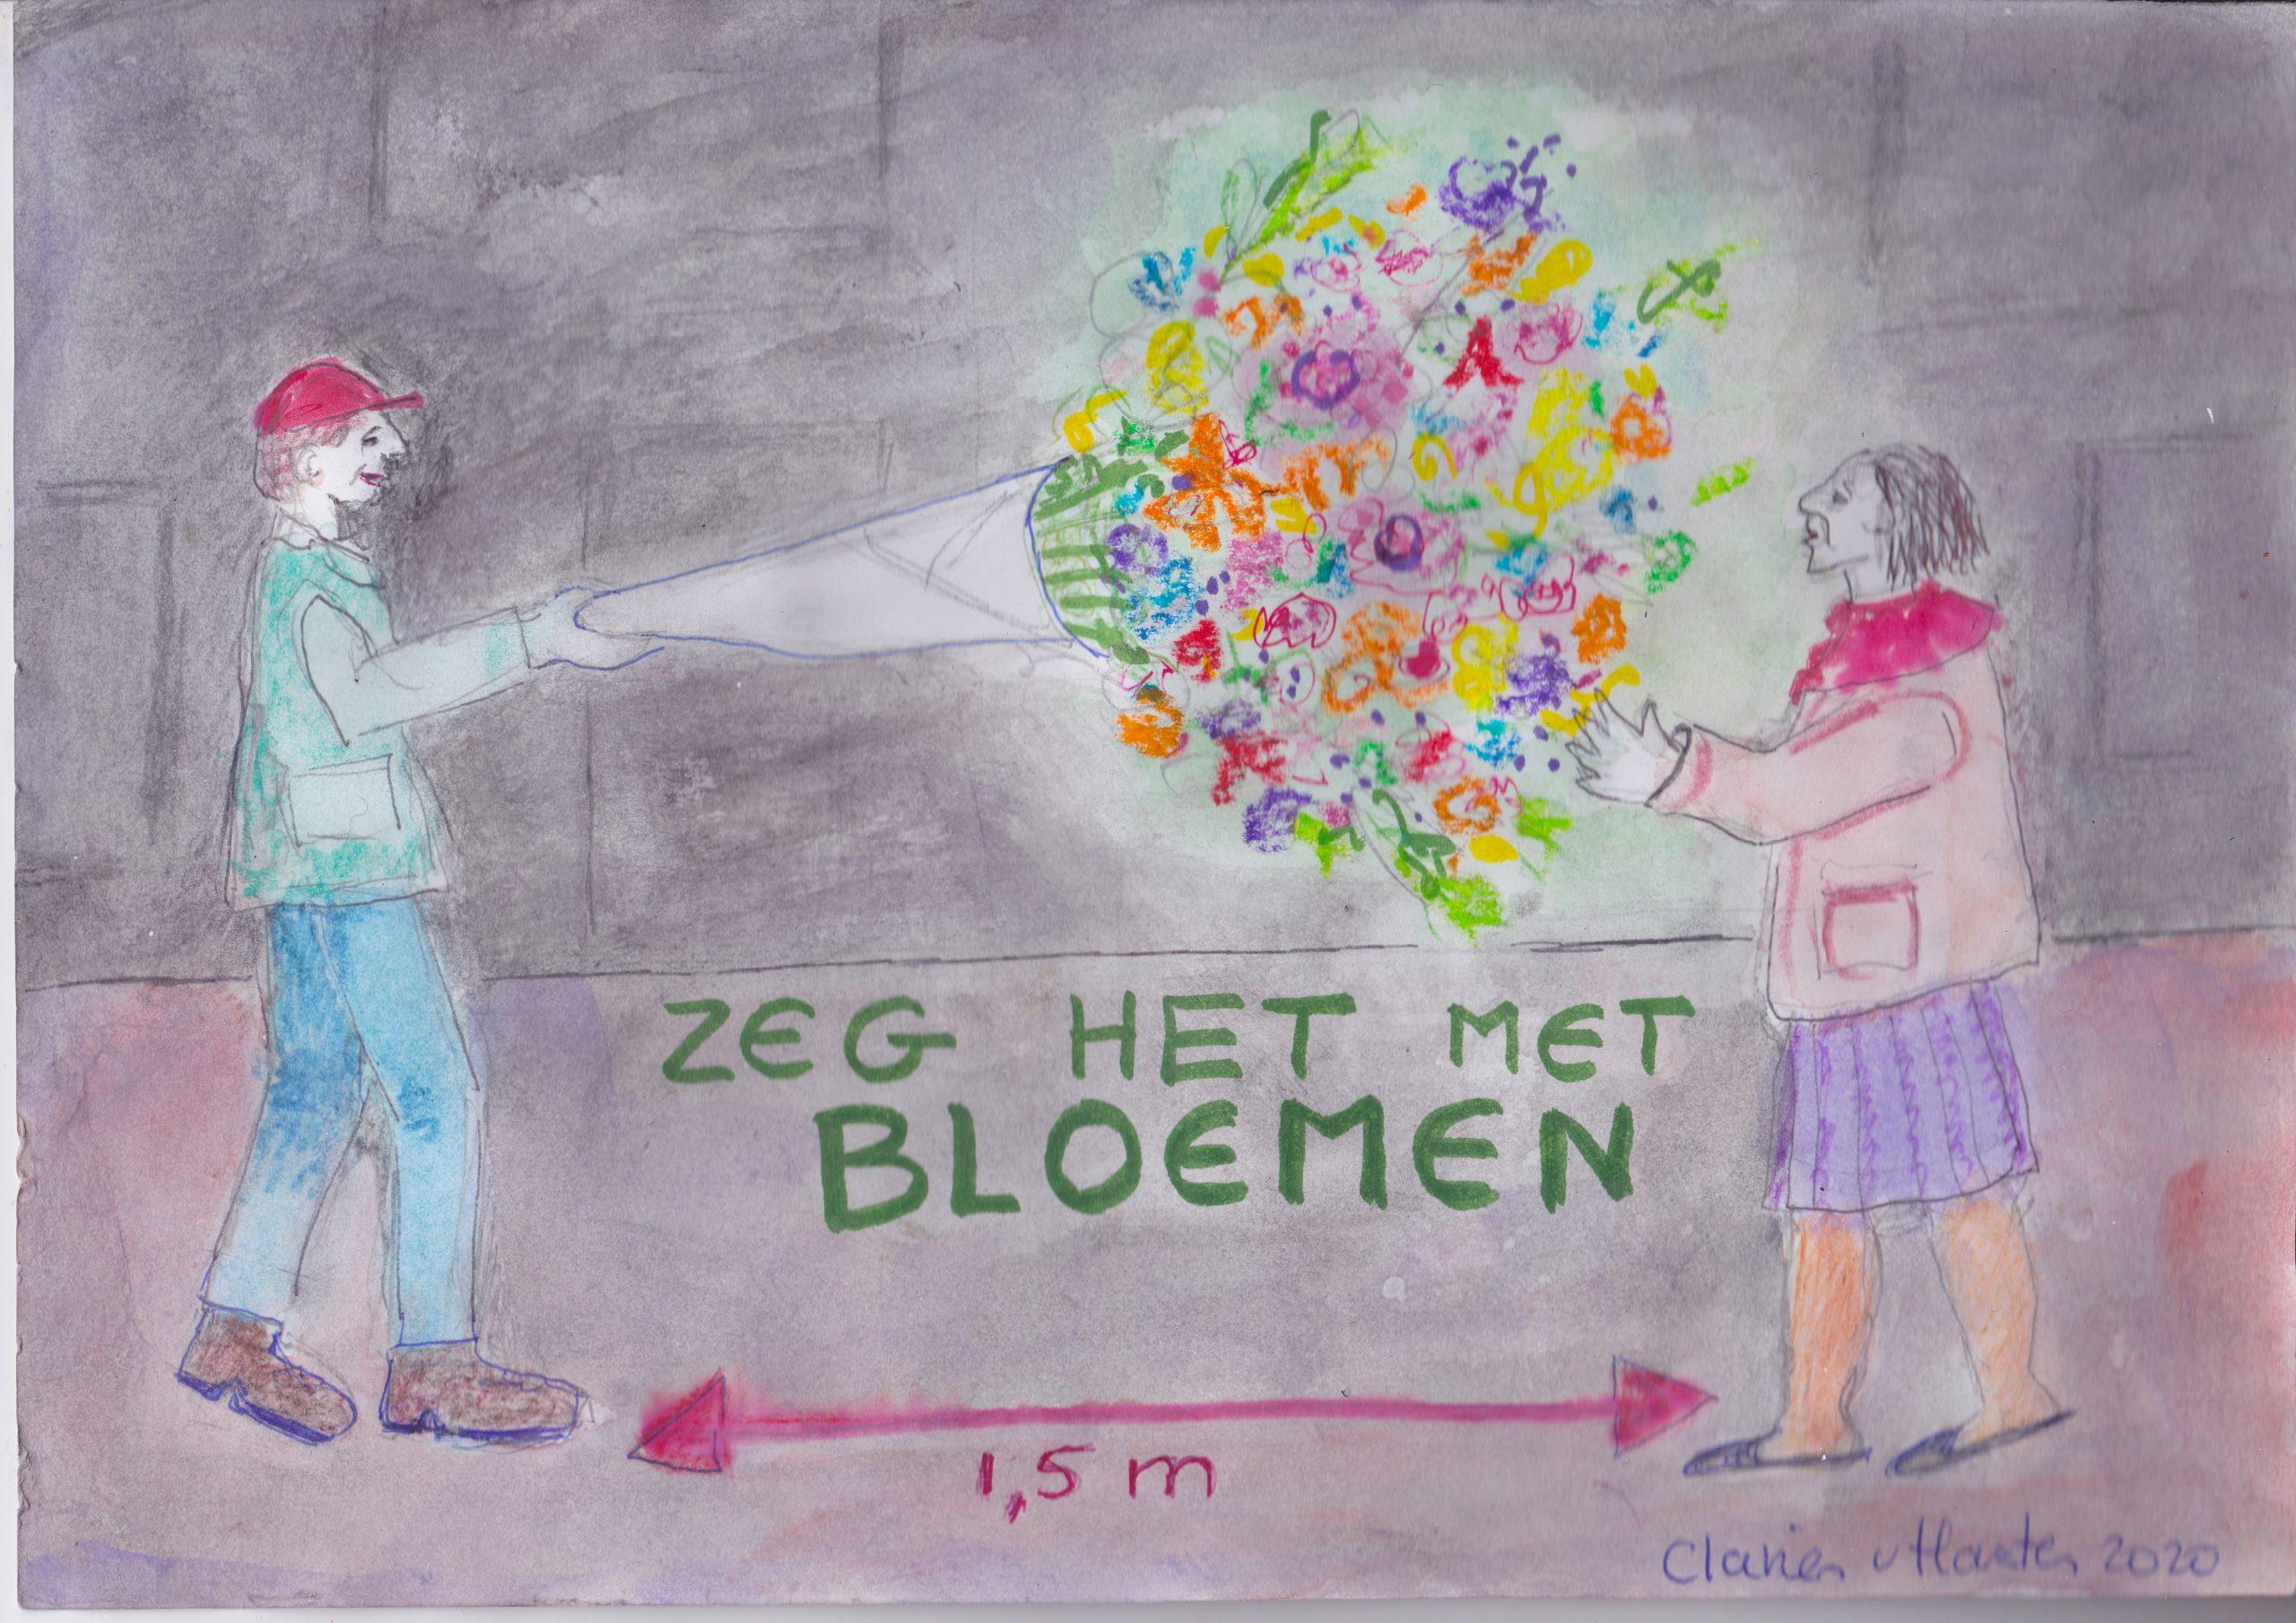 prijswinnend bij oproep Museum Arnhem